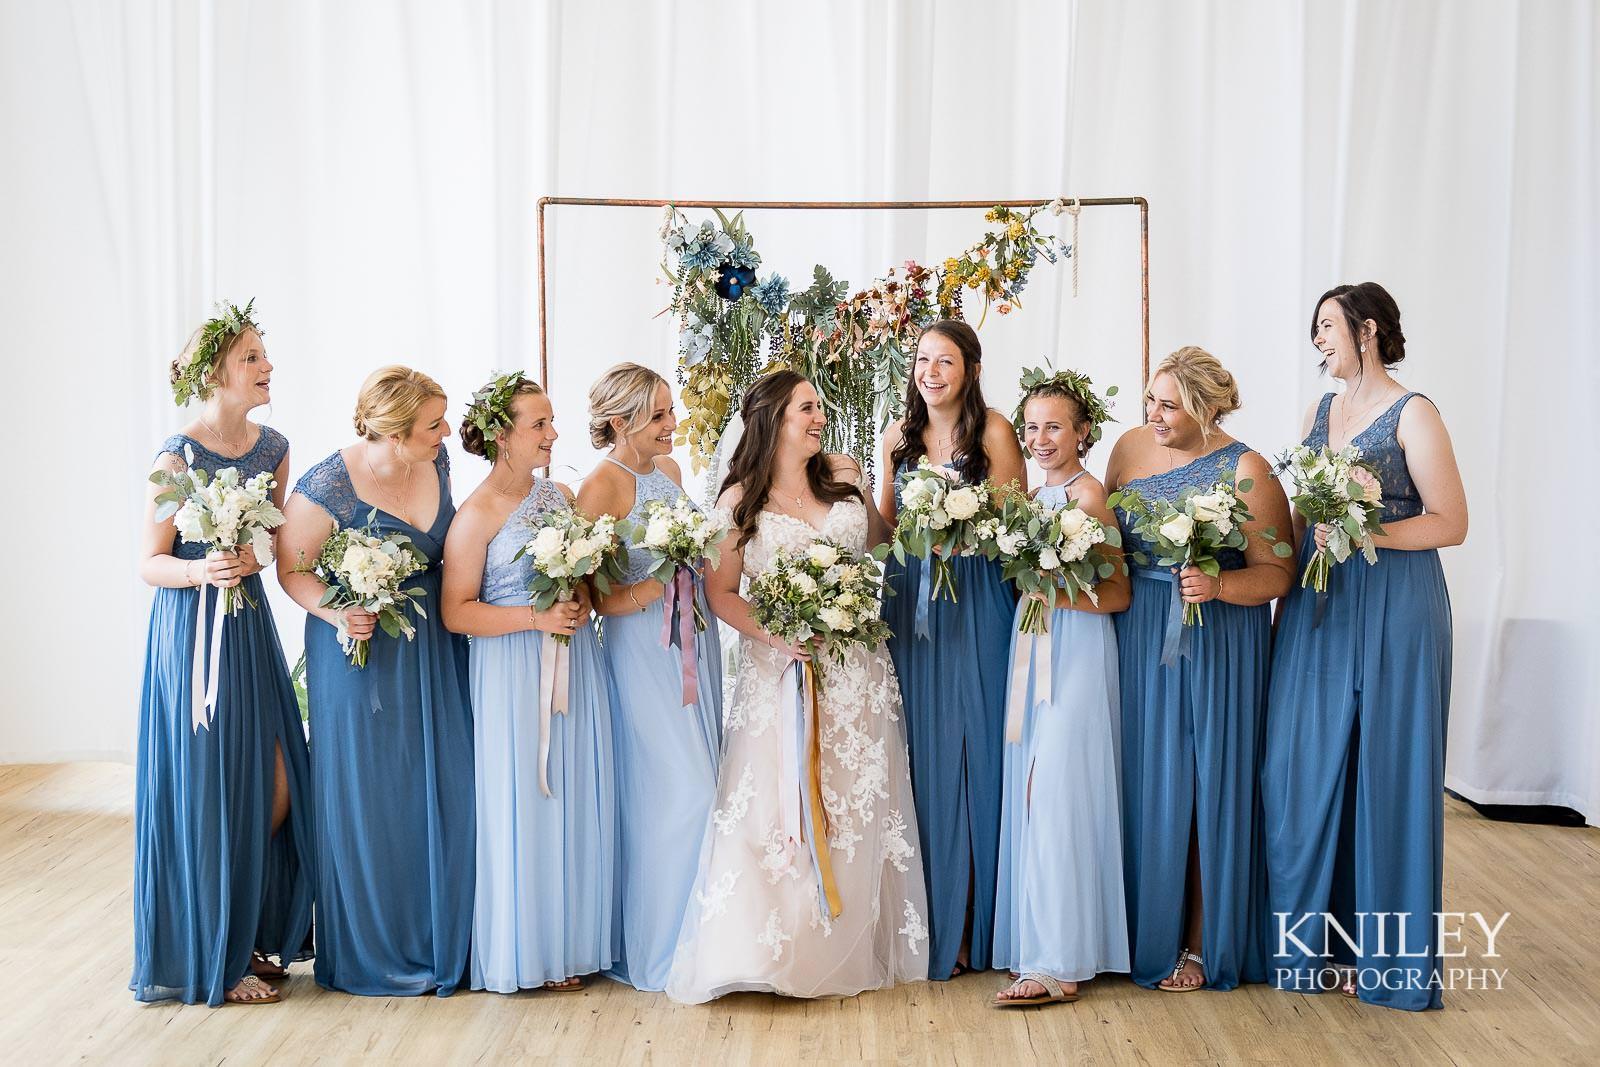 24-Arbor-at-the-Port-Rochester-NY-Wedding-Photography.jpg